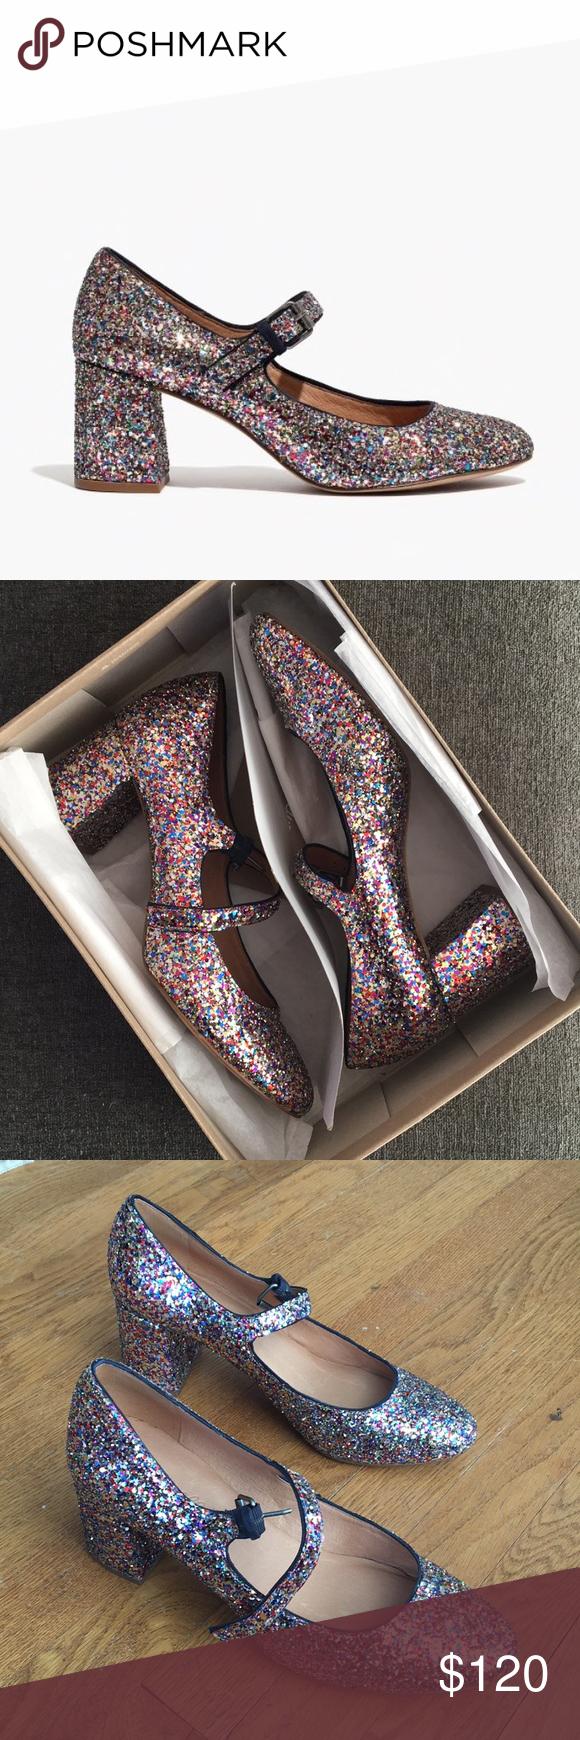 ebb7b20c3666 Madewell Zelda Mary Jane in Glitter Madewell Zelda Mary Jane in glitter  heels